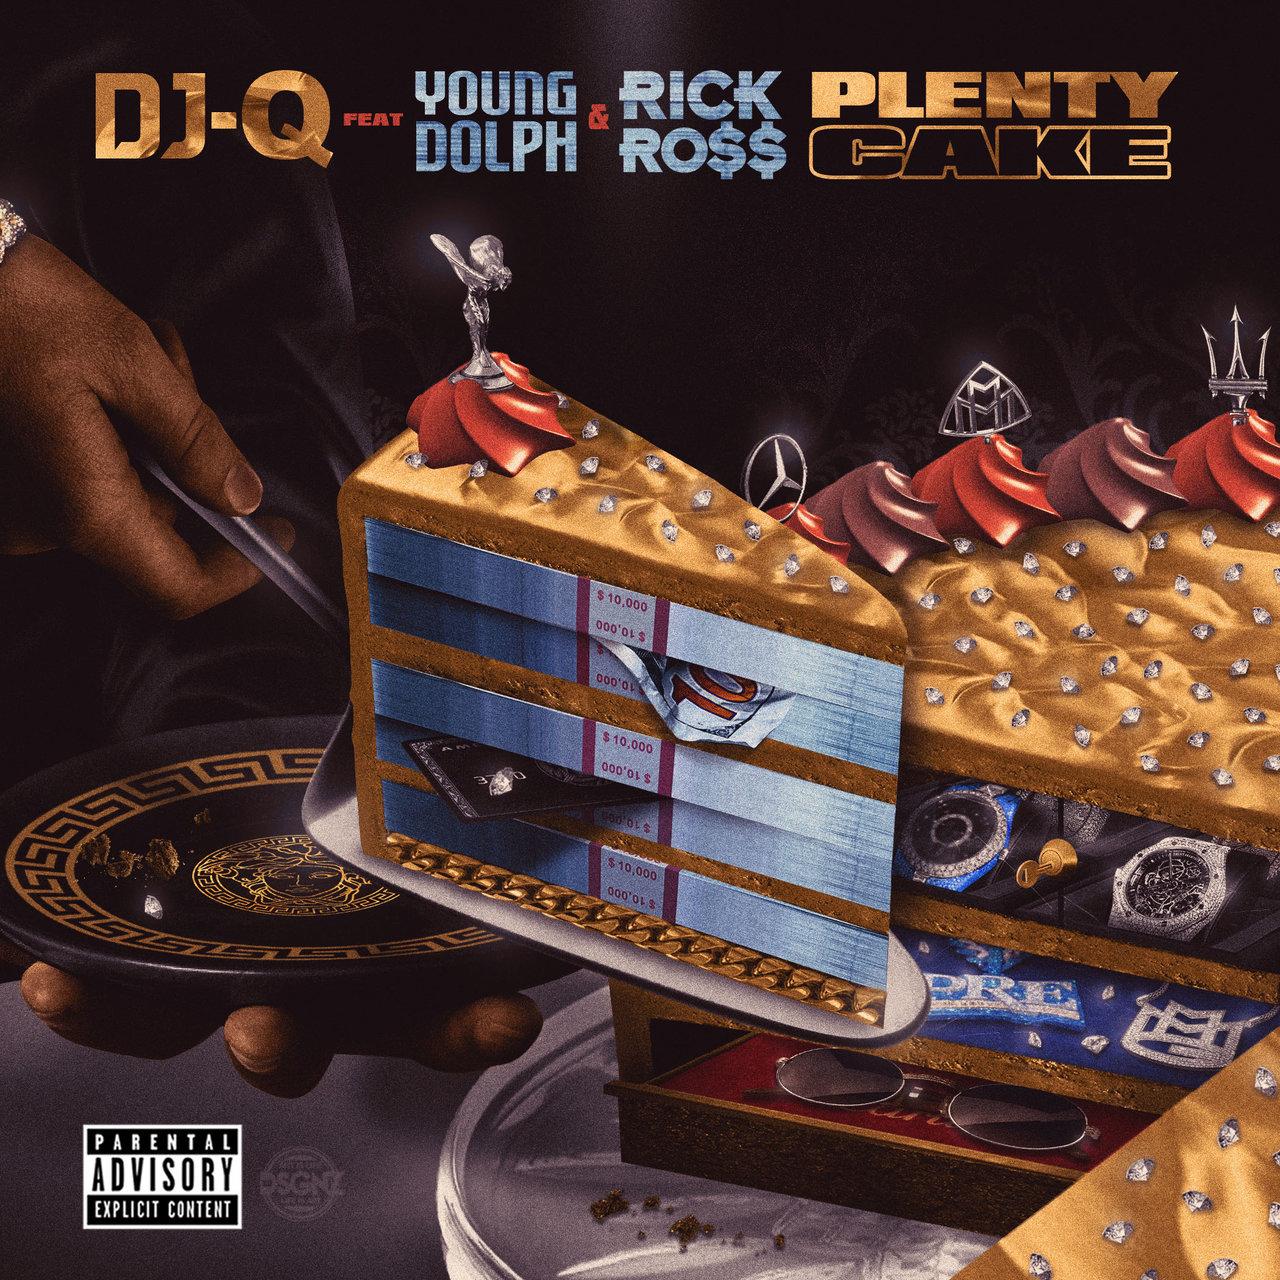 DOWNLOAD MP3: DJ-Q Ft. Young Dolph & Rick Ross – Plenty Cake